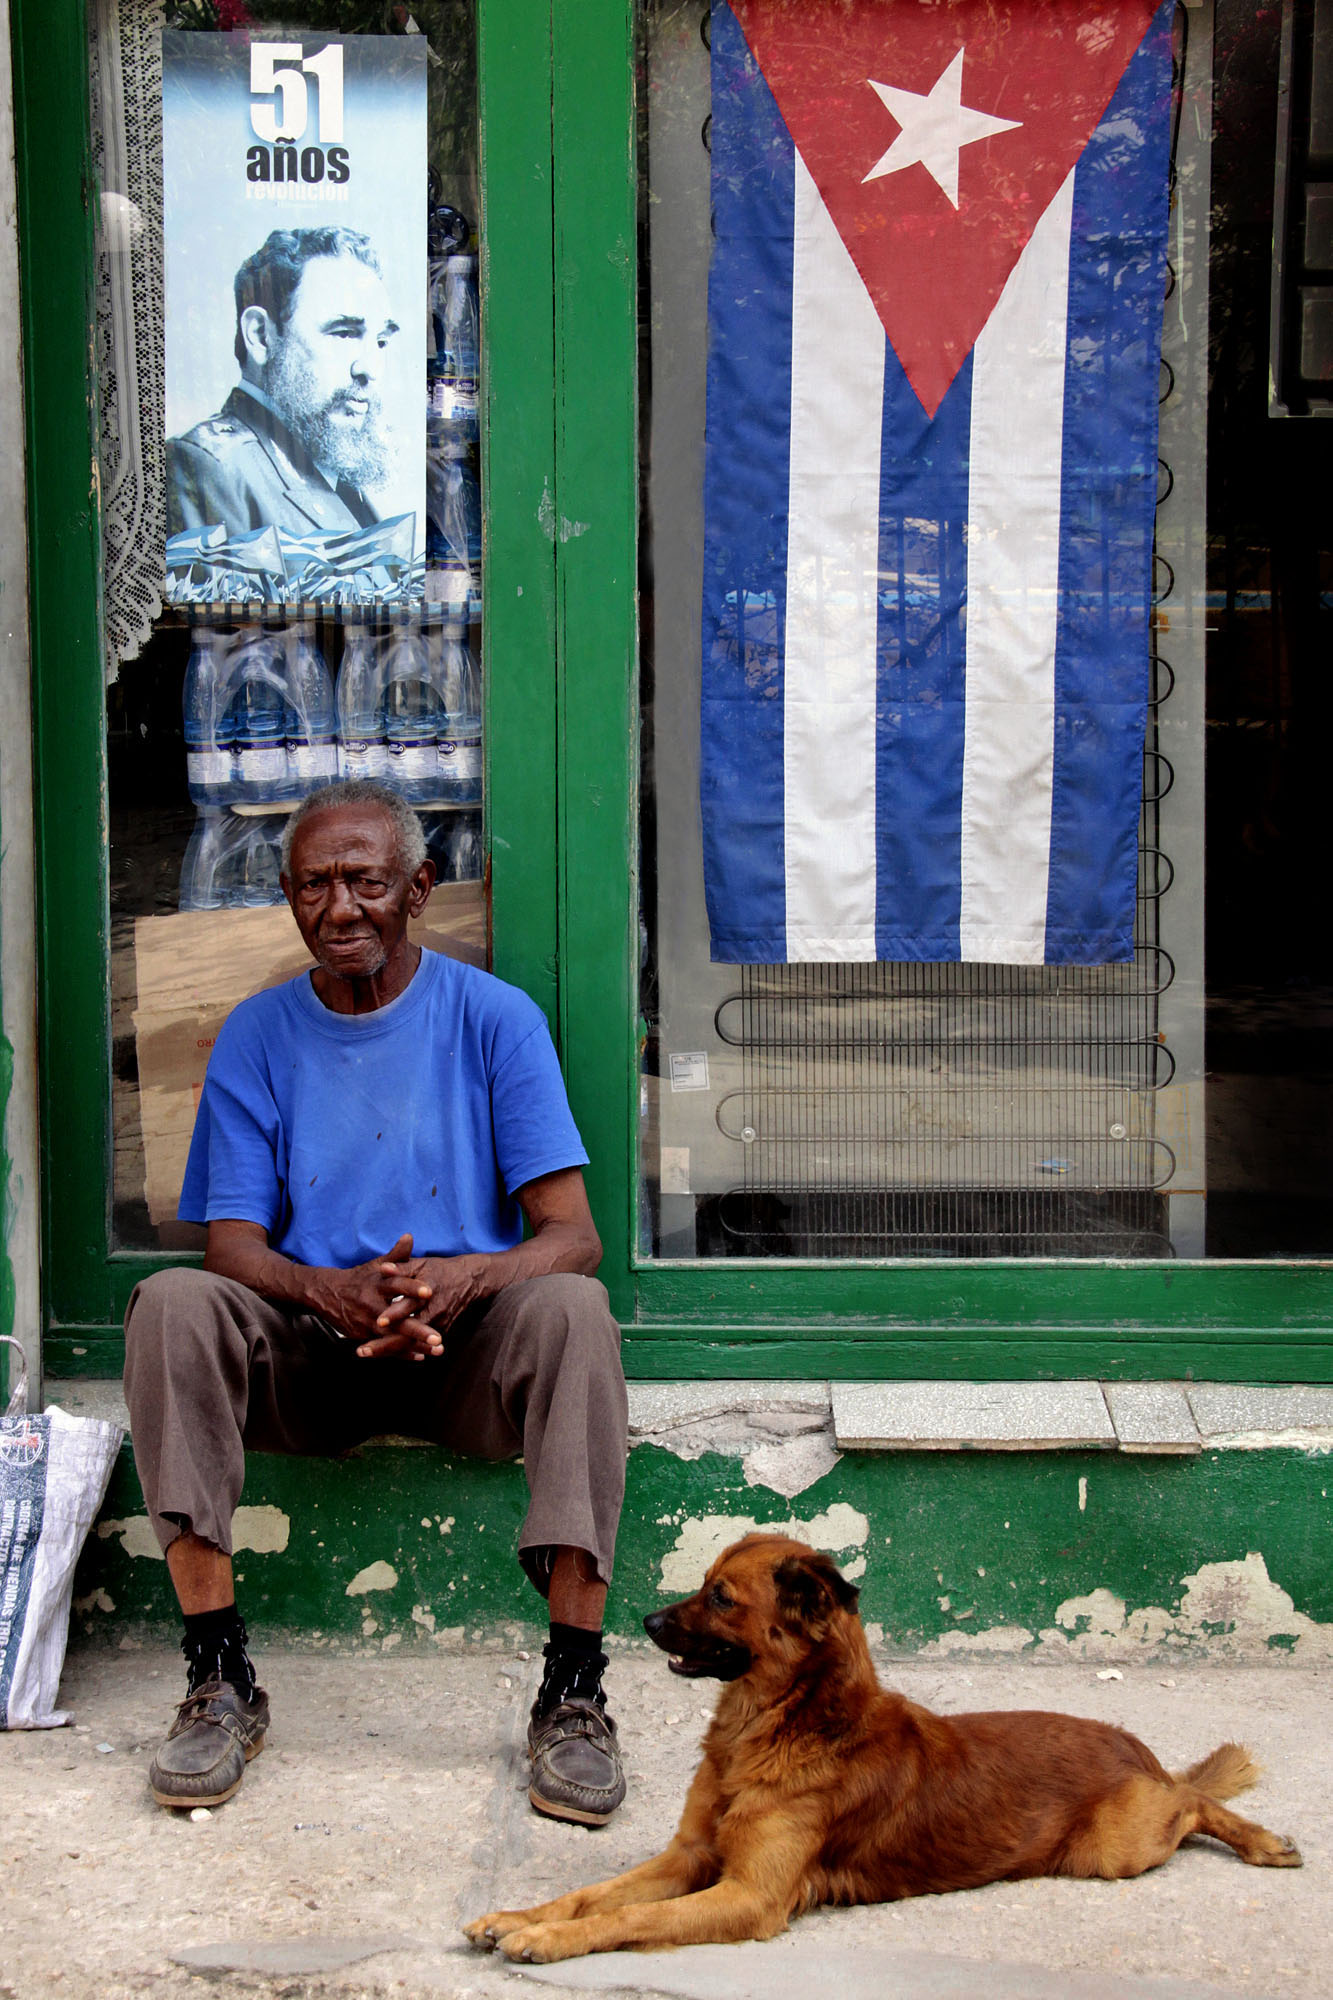 Hugh_Perry_Cuban Icons.jpg